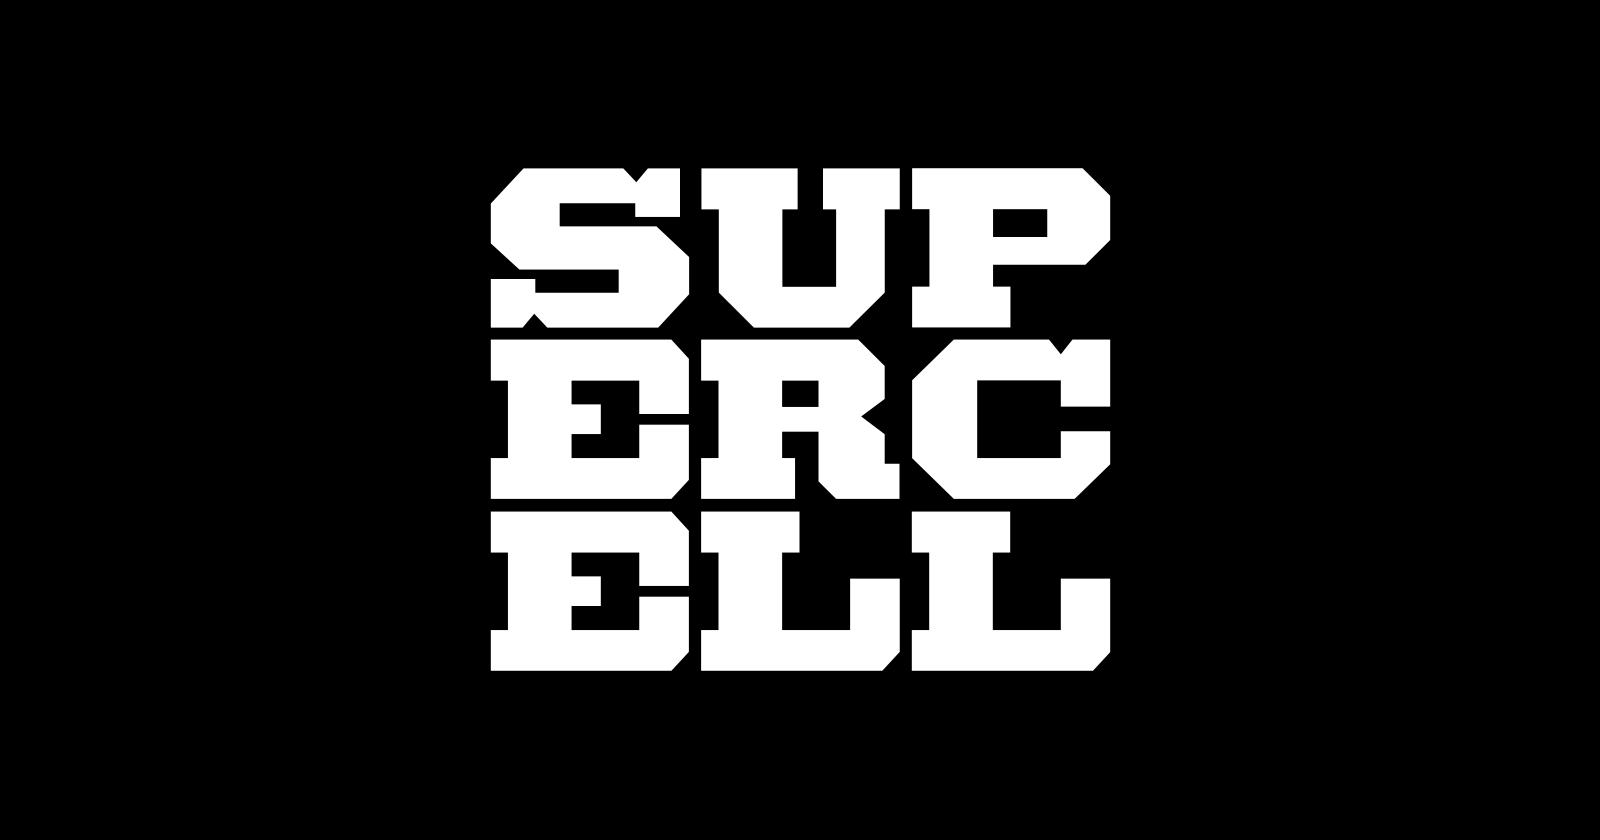 SuperCell vende su franquicia Clash Royale a Nintendo por $36,000,000 USD